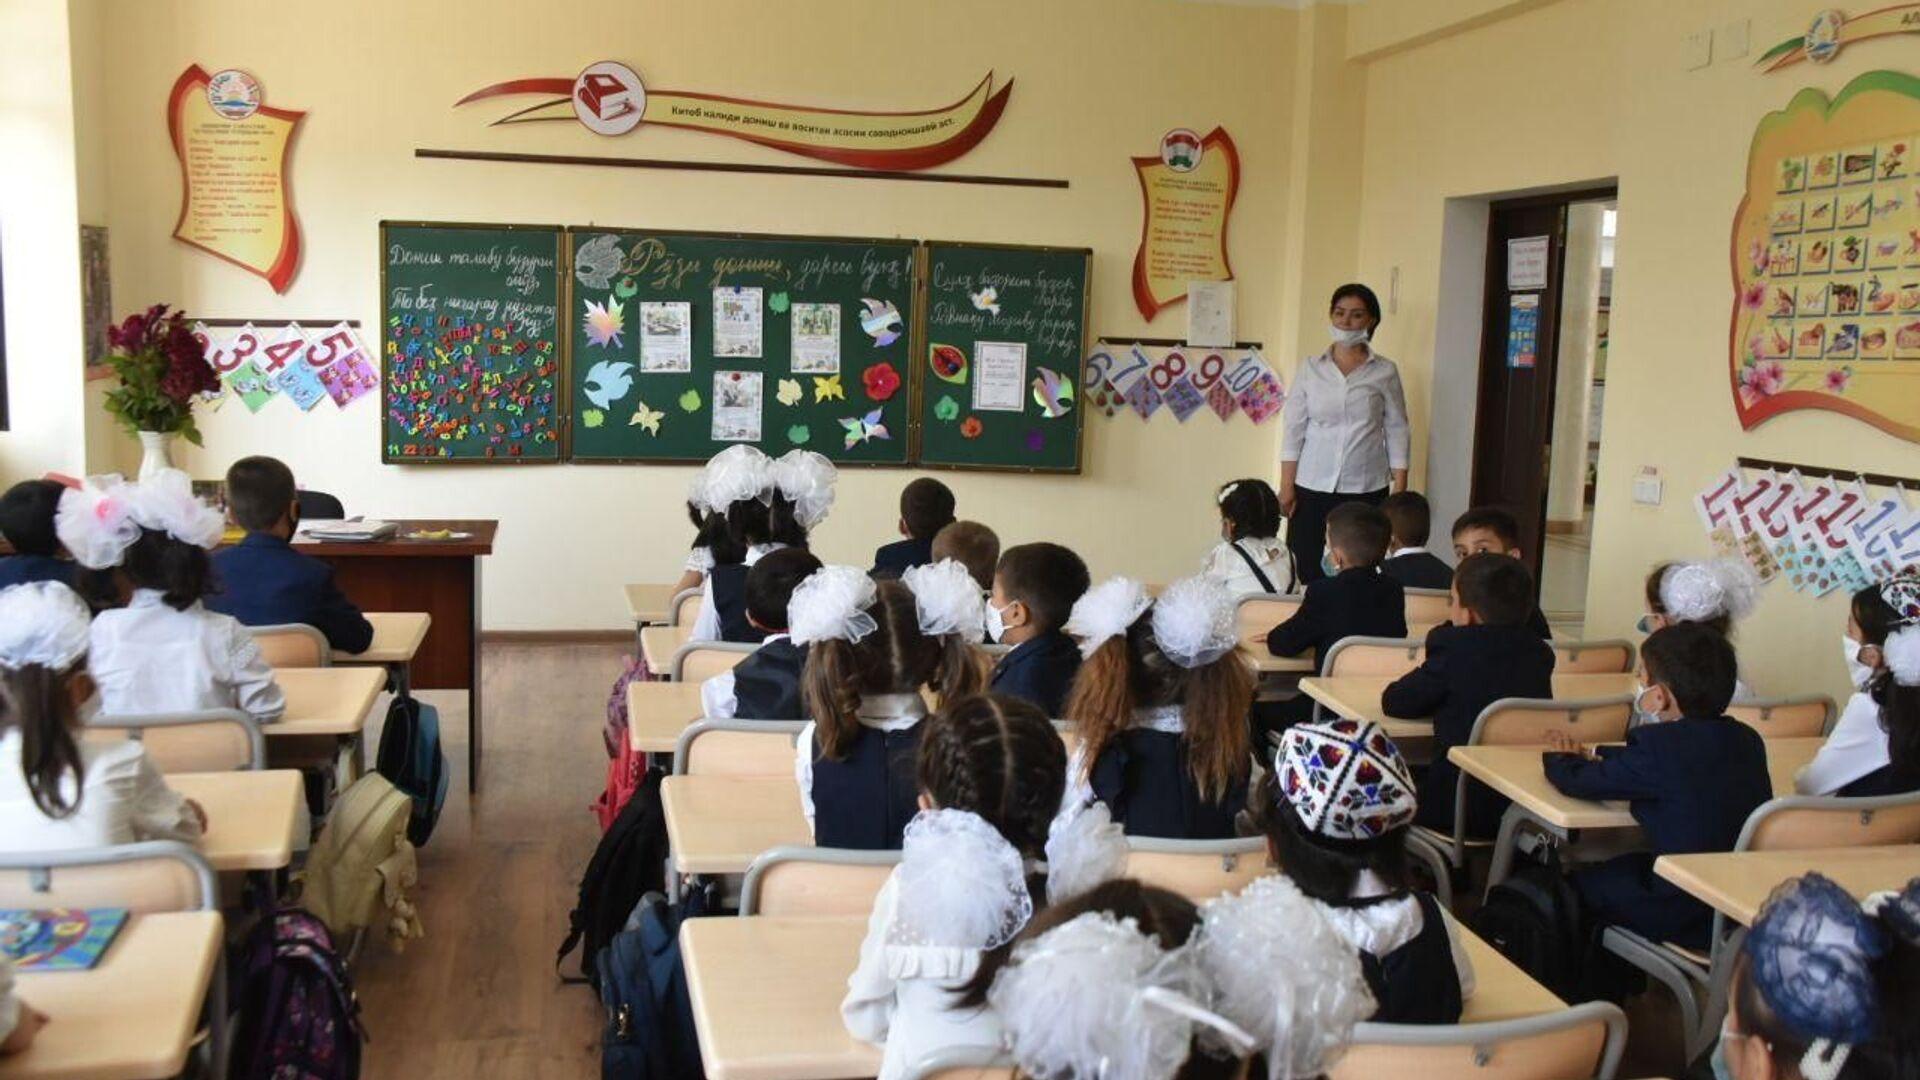 Начало учебного года в Таджикистане - Sputnik Тоҷикистон, 1920, 30.04.2021